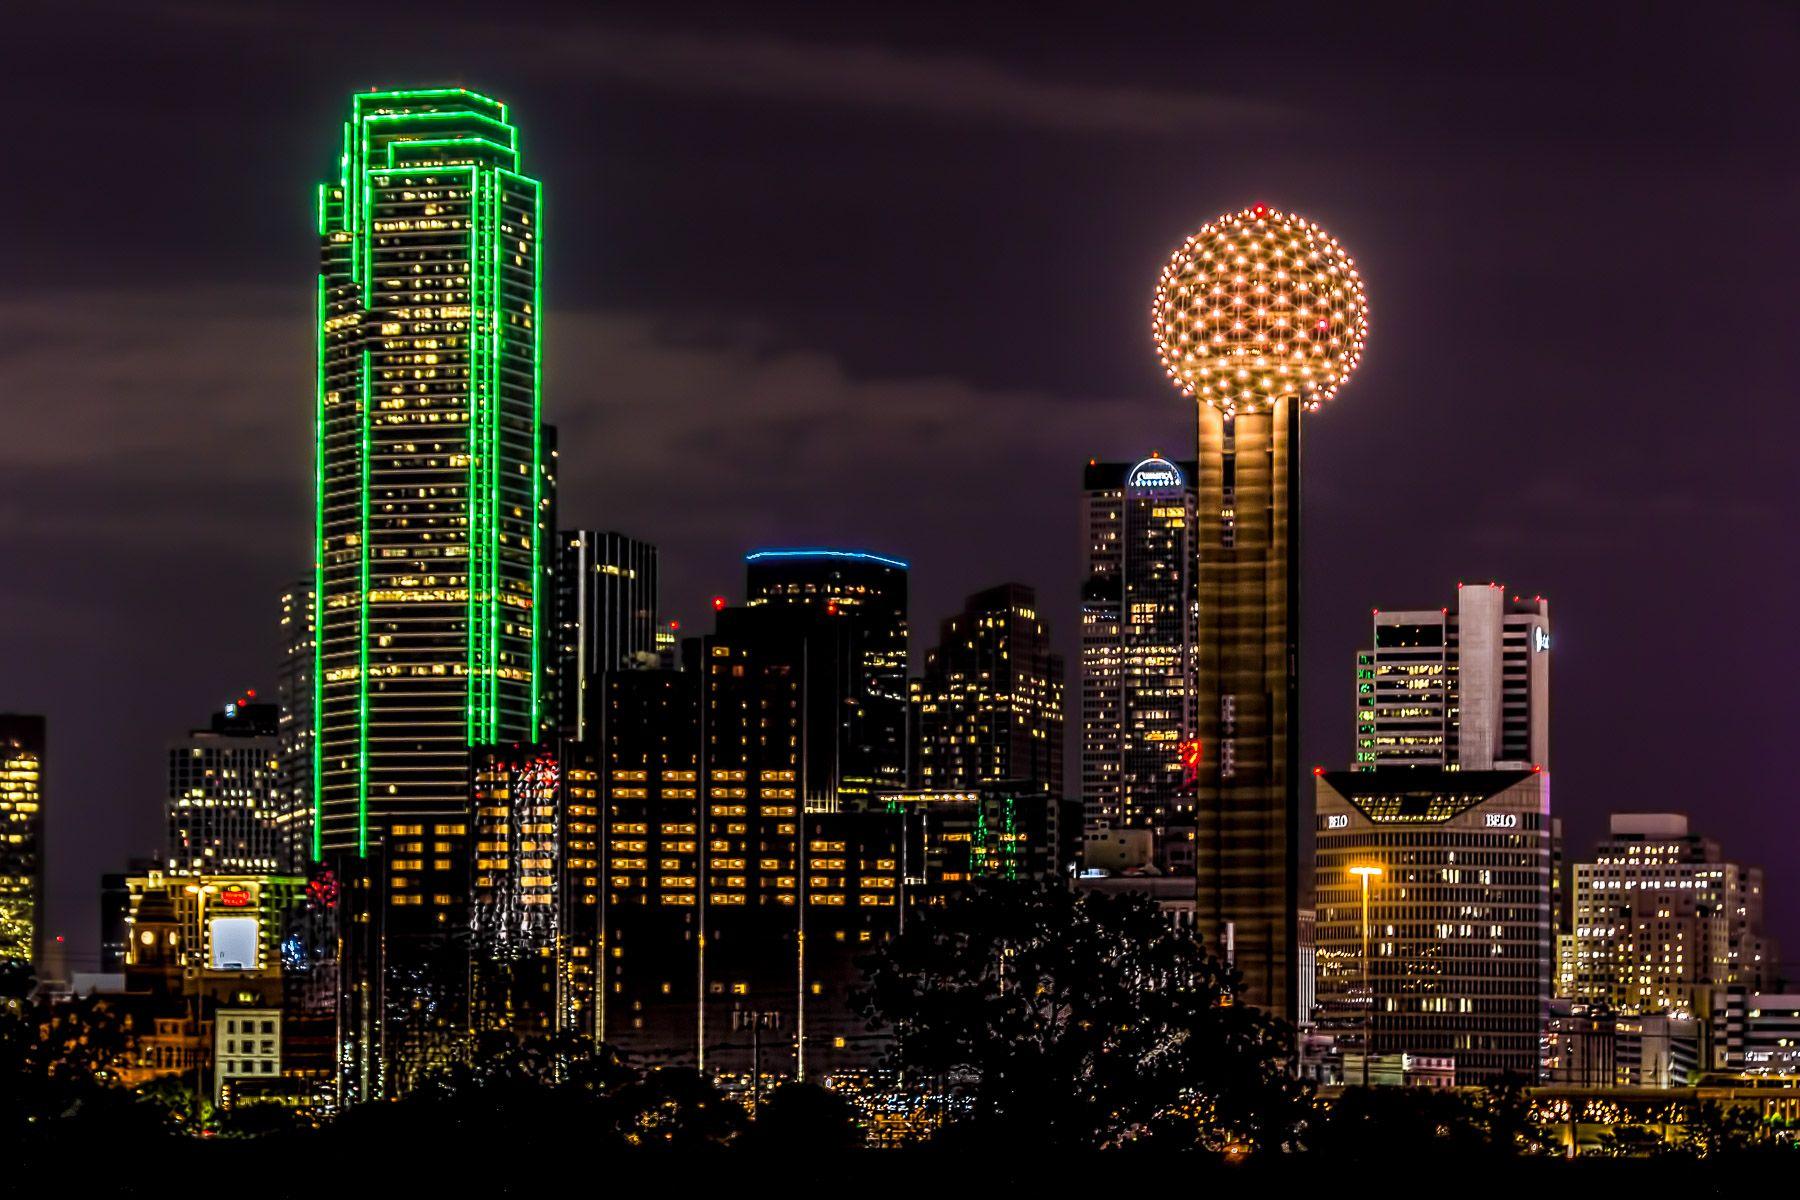 dallas skyline wallpaper  Dallas Skyline Wallpaper | Downtown Dallas Skyline | Dallas ...